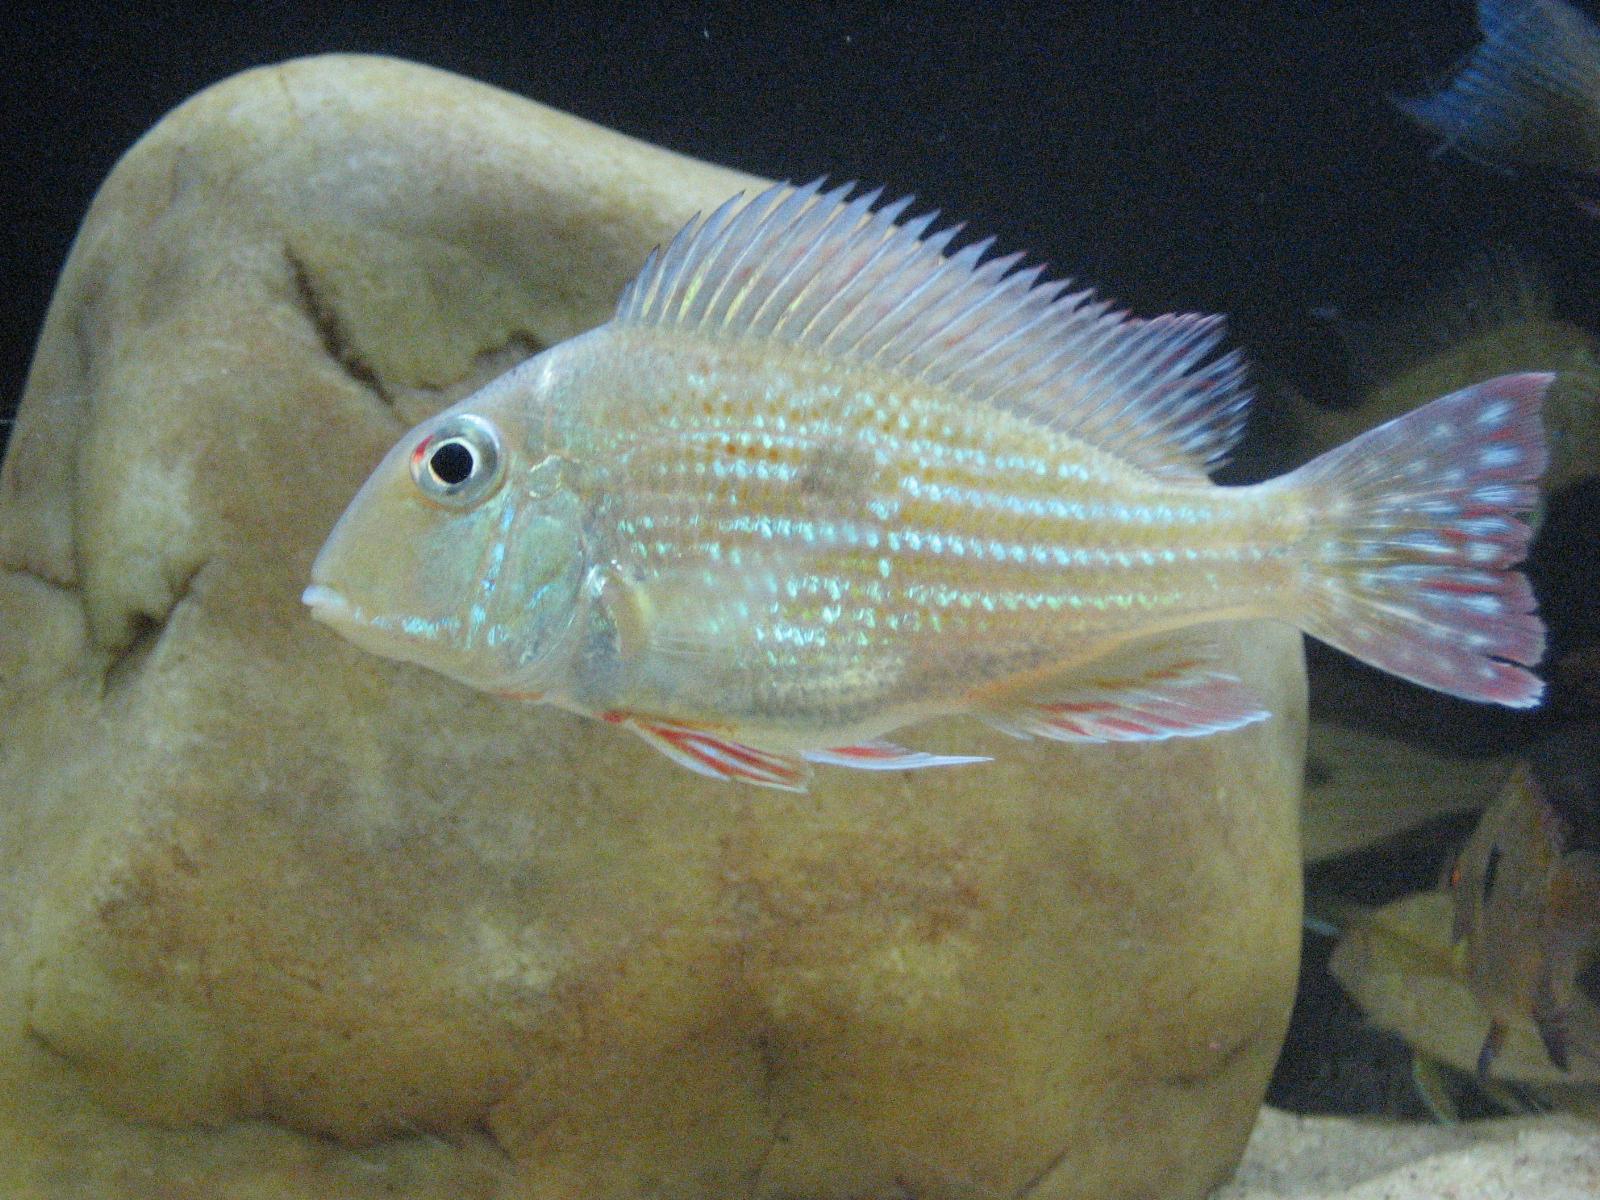 cichlids.com: Geophagus dicrozoster